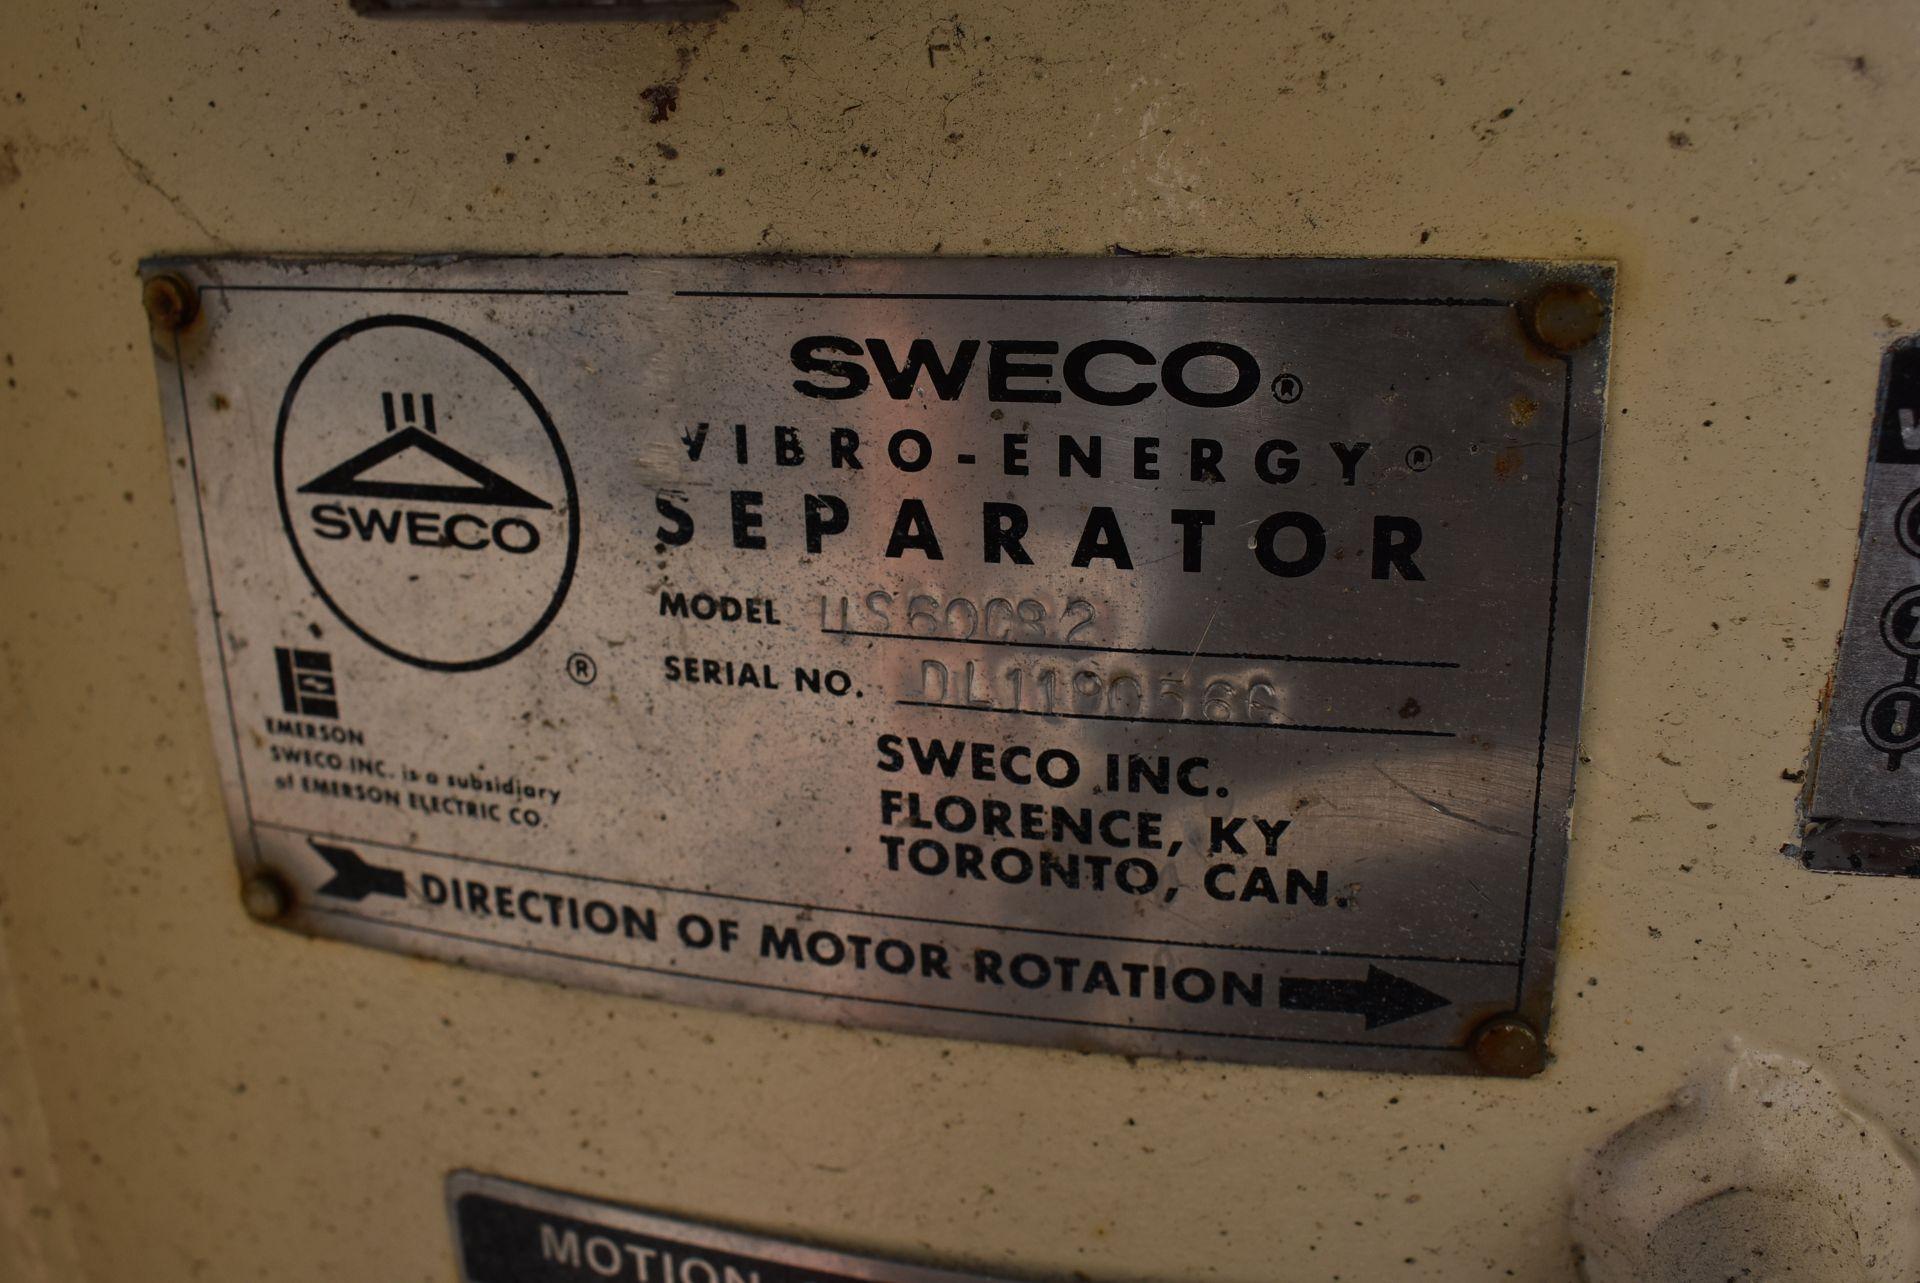 SWECO Model #US60C82 Vibratory Separator - Image 2 of 3